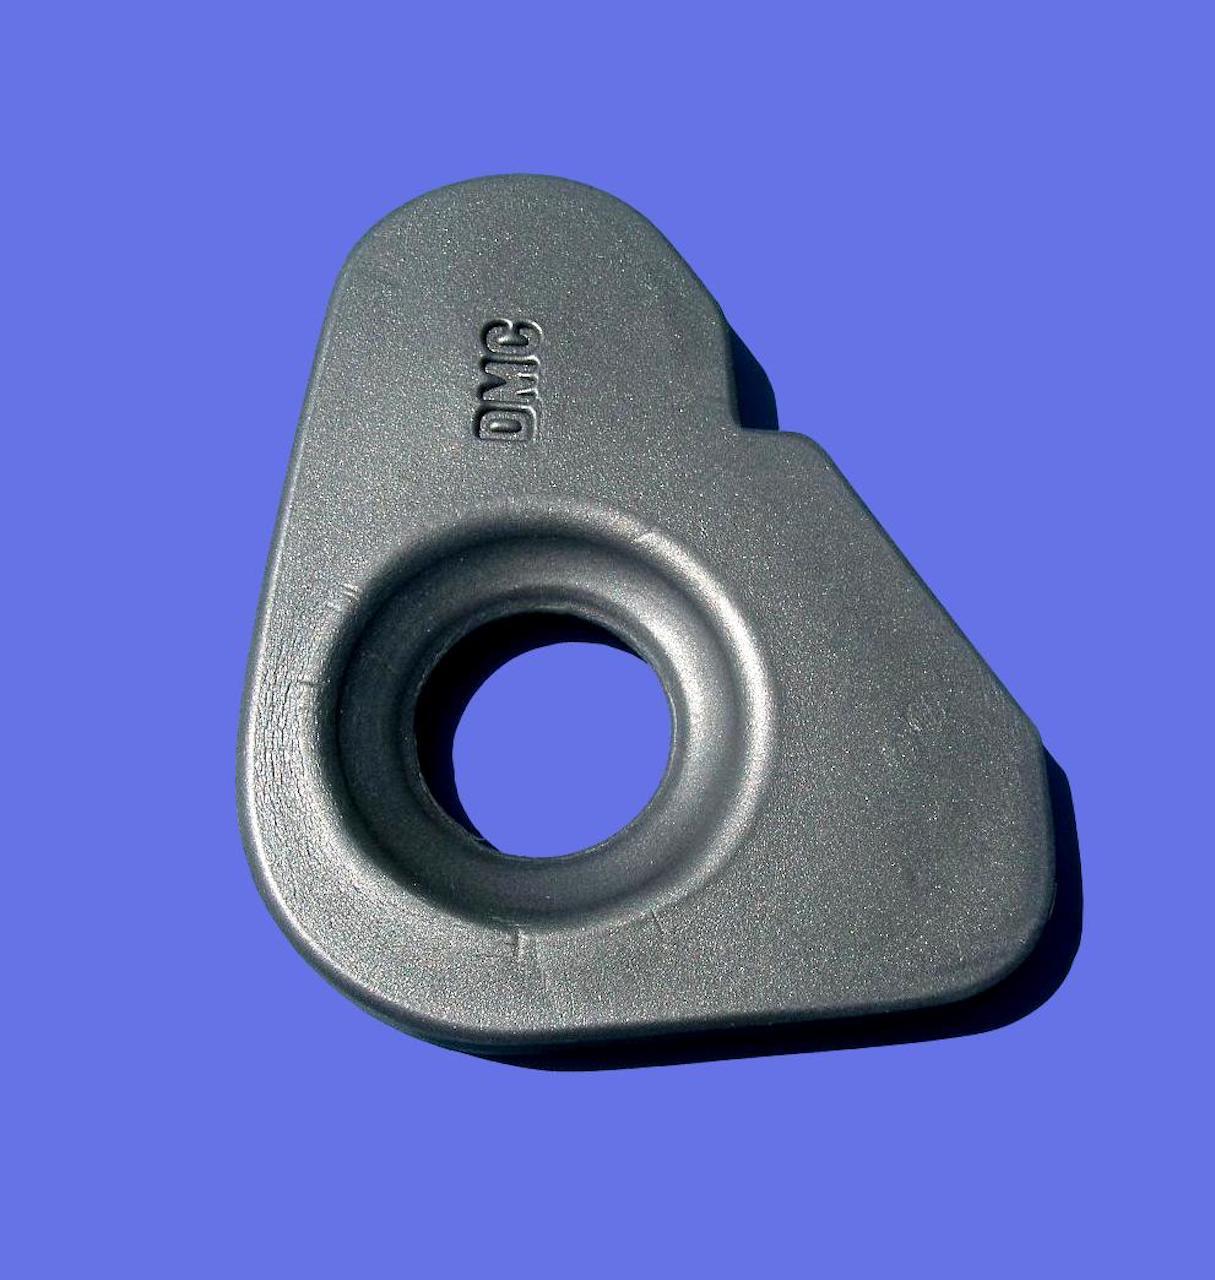 Danchuk 232 Steering Column Firewall Seal